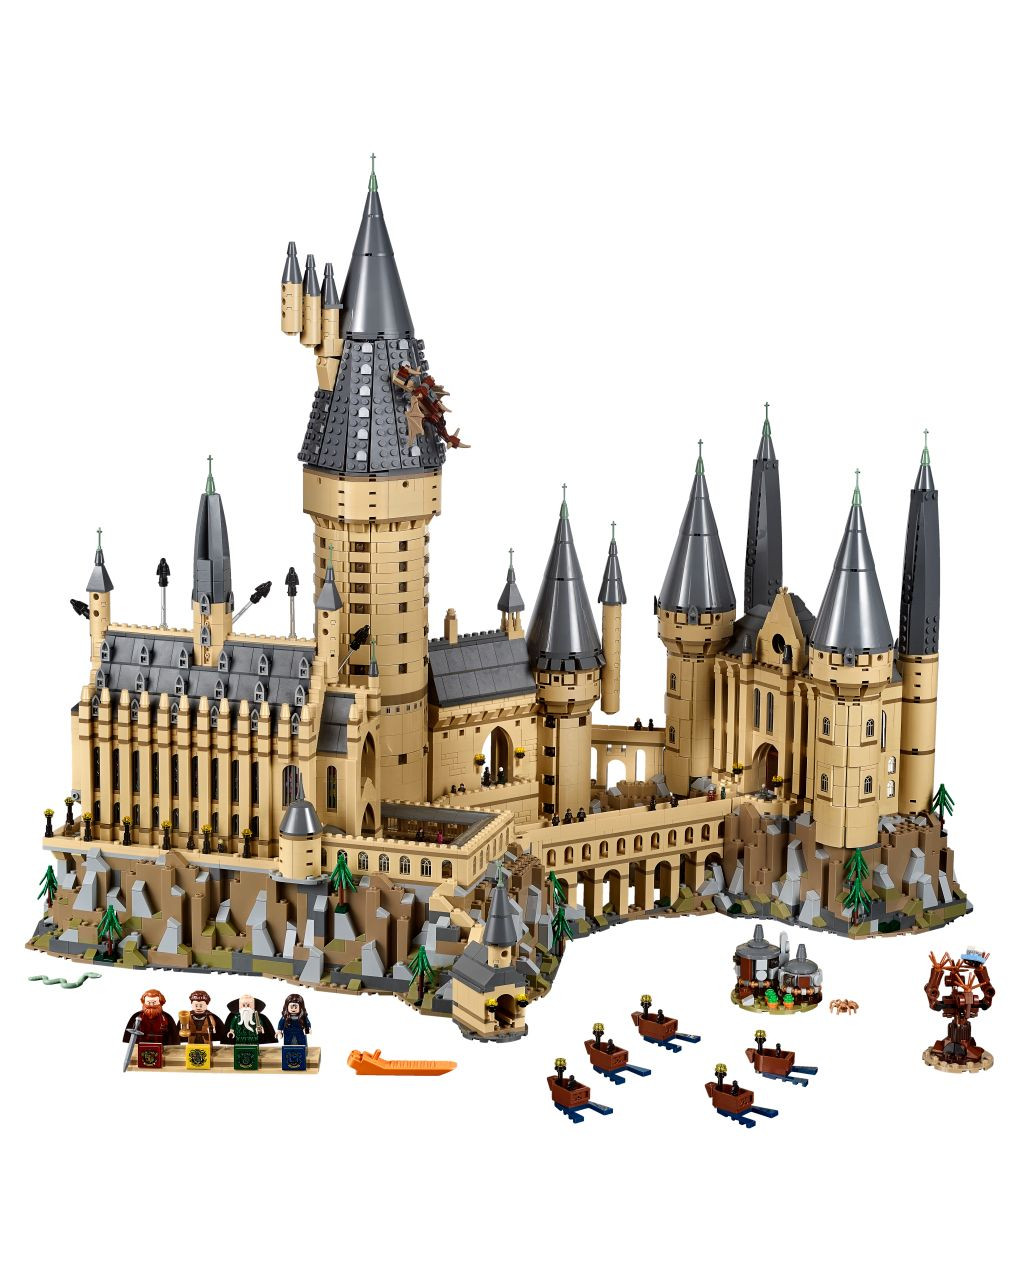 Lego harry potter tm - castello di hogwarts™ - 71043 - LEGO